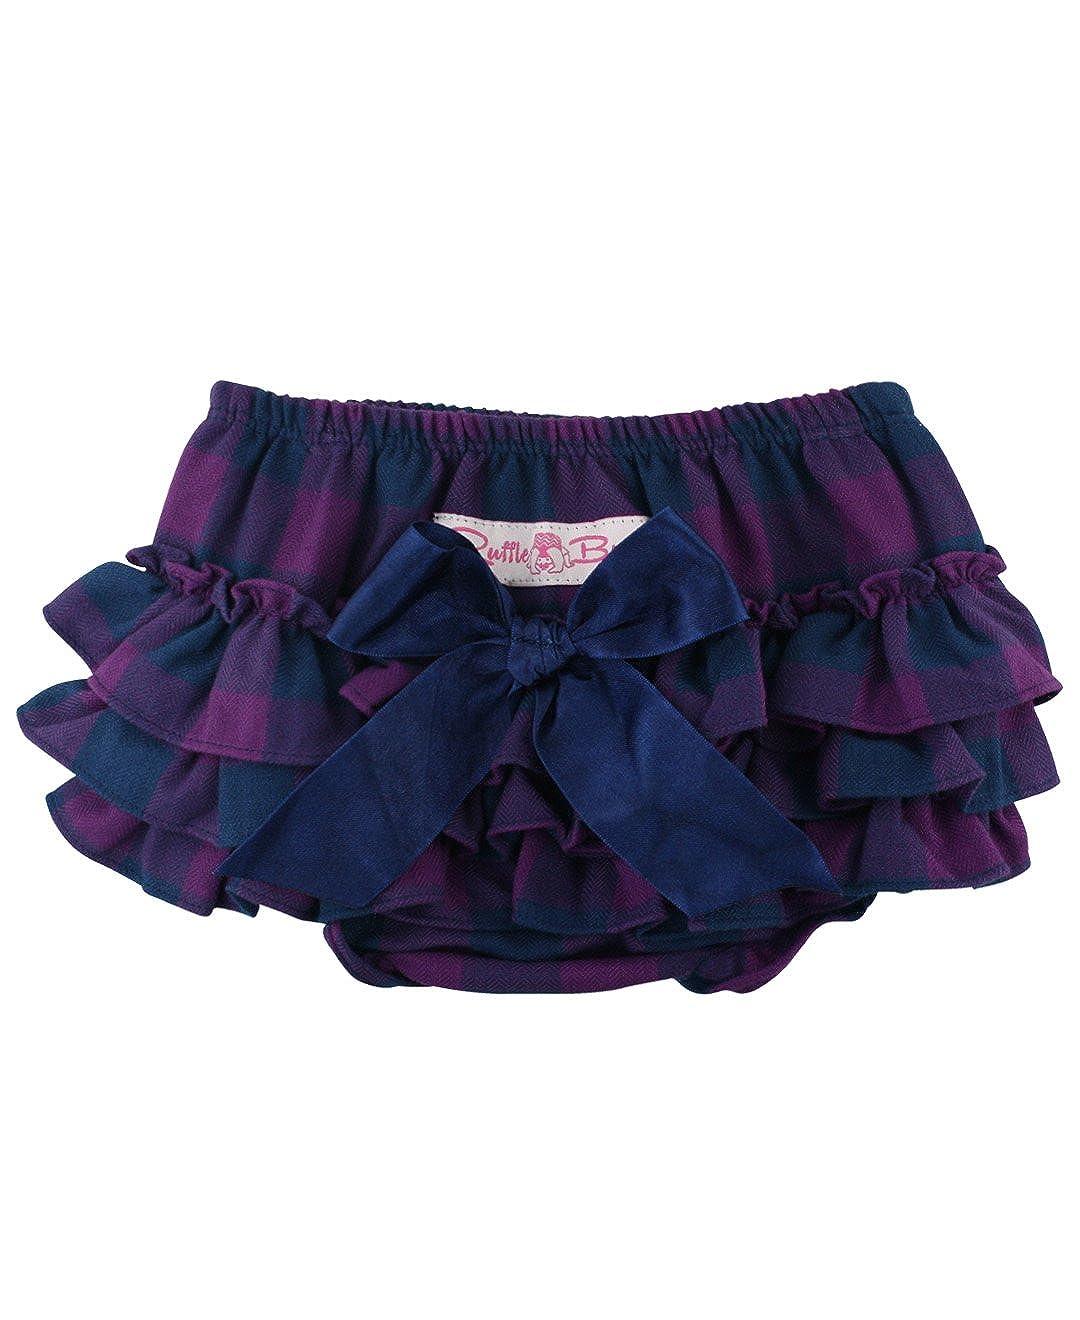 RuffleButts Baby/Toddler Girls Buffalo Plaid Ruffled Bloomer w/Bow RBWYYXX-BF00-SC-BABY